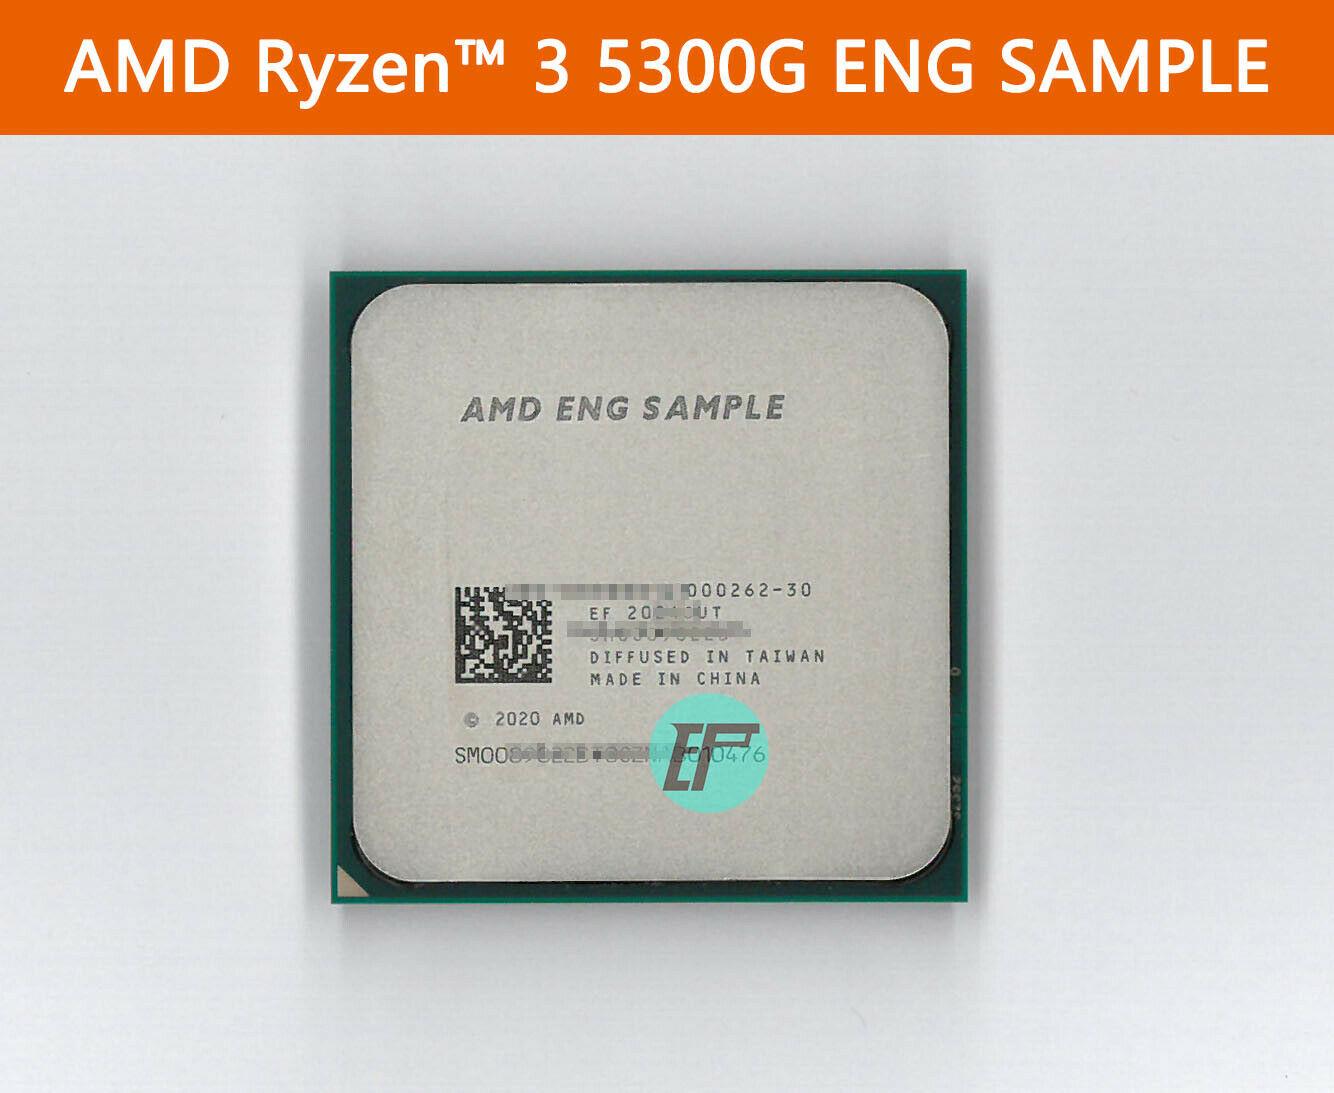 amd-ryzen-5-5300g-4-core-zen-3-desktop-apu-_-benchmarks-_7